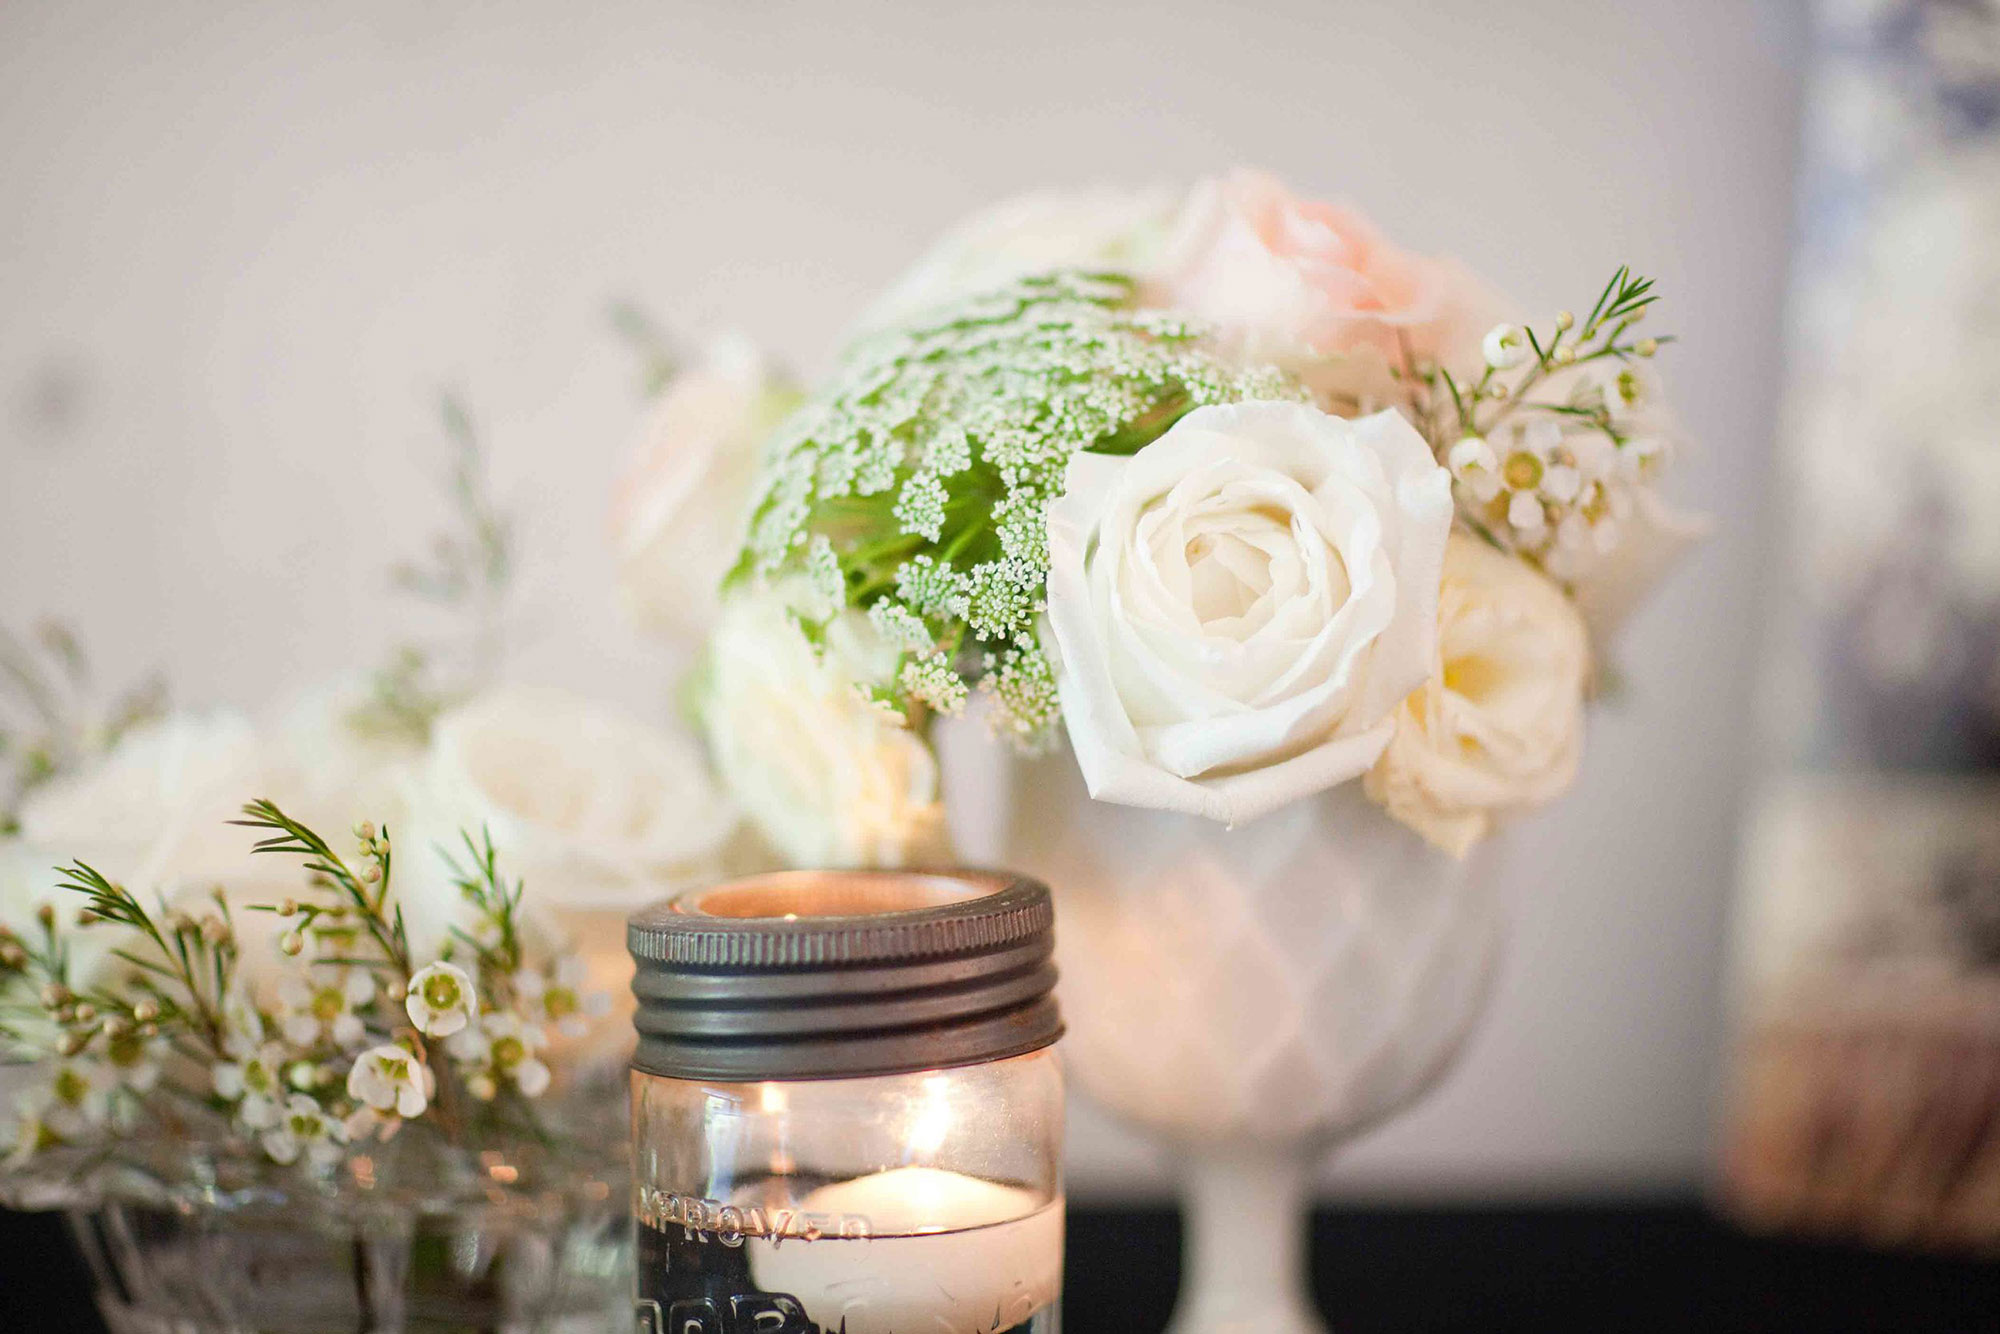 Amanda-Cowley-Willowbank-Vineyard-Bride-Photo-By-White-Photographie-040.jpg